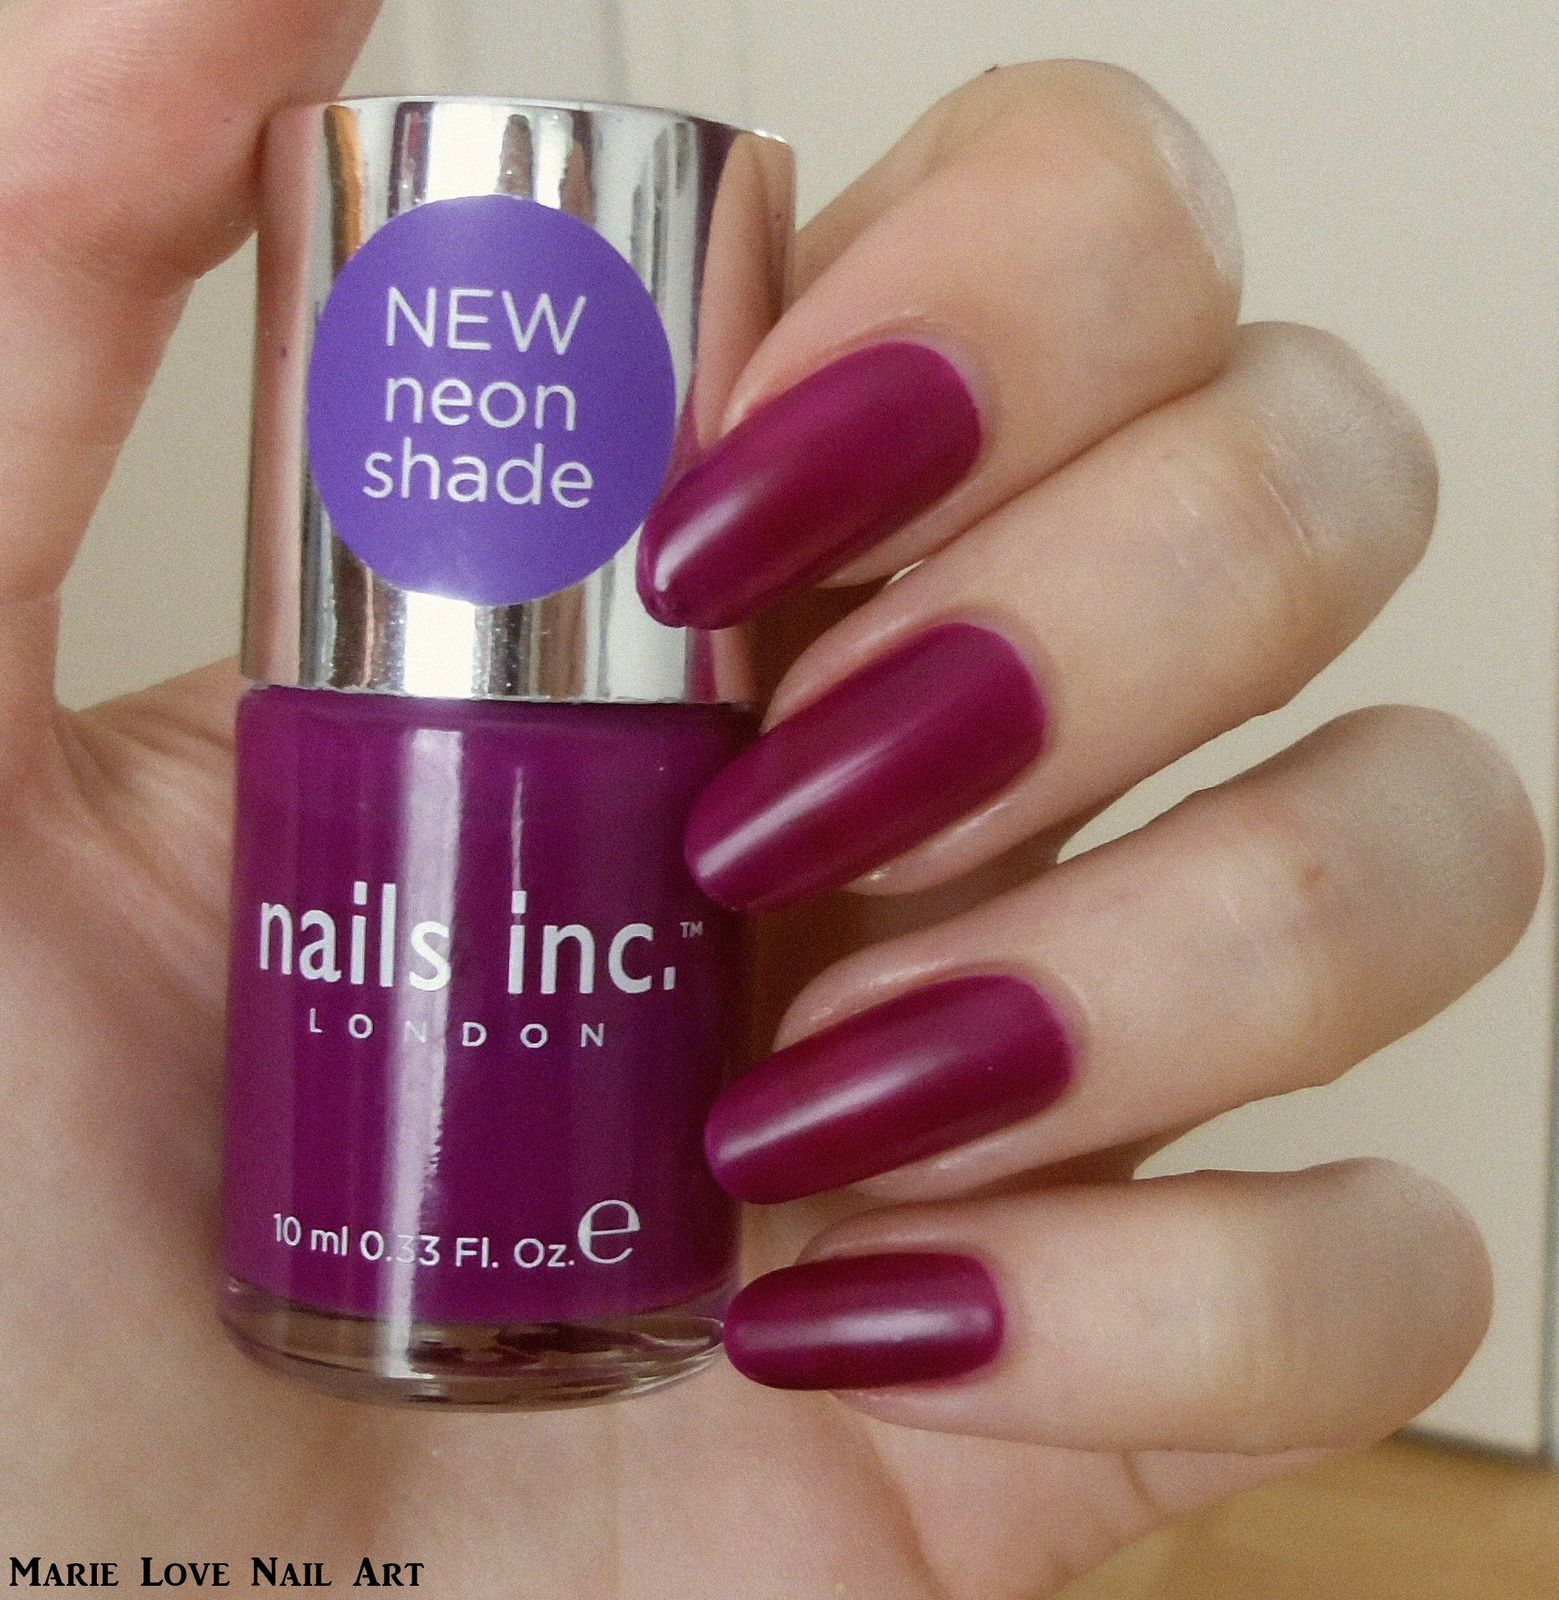 NailS Inc Neon Shade - Holland Park n°163